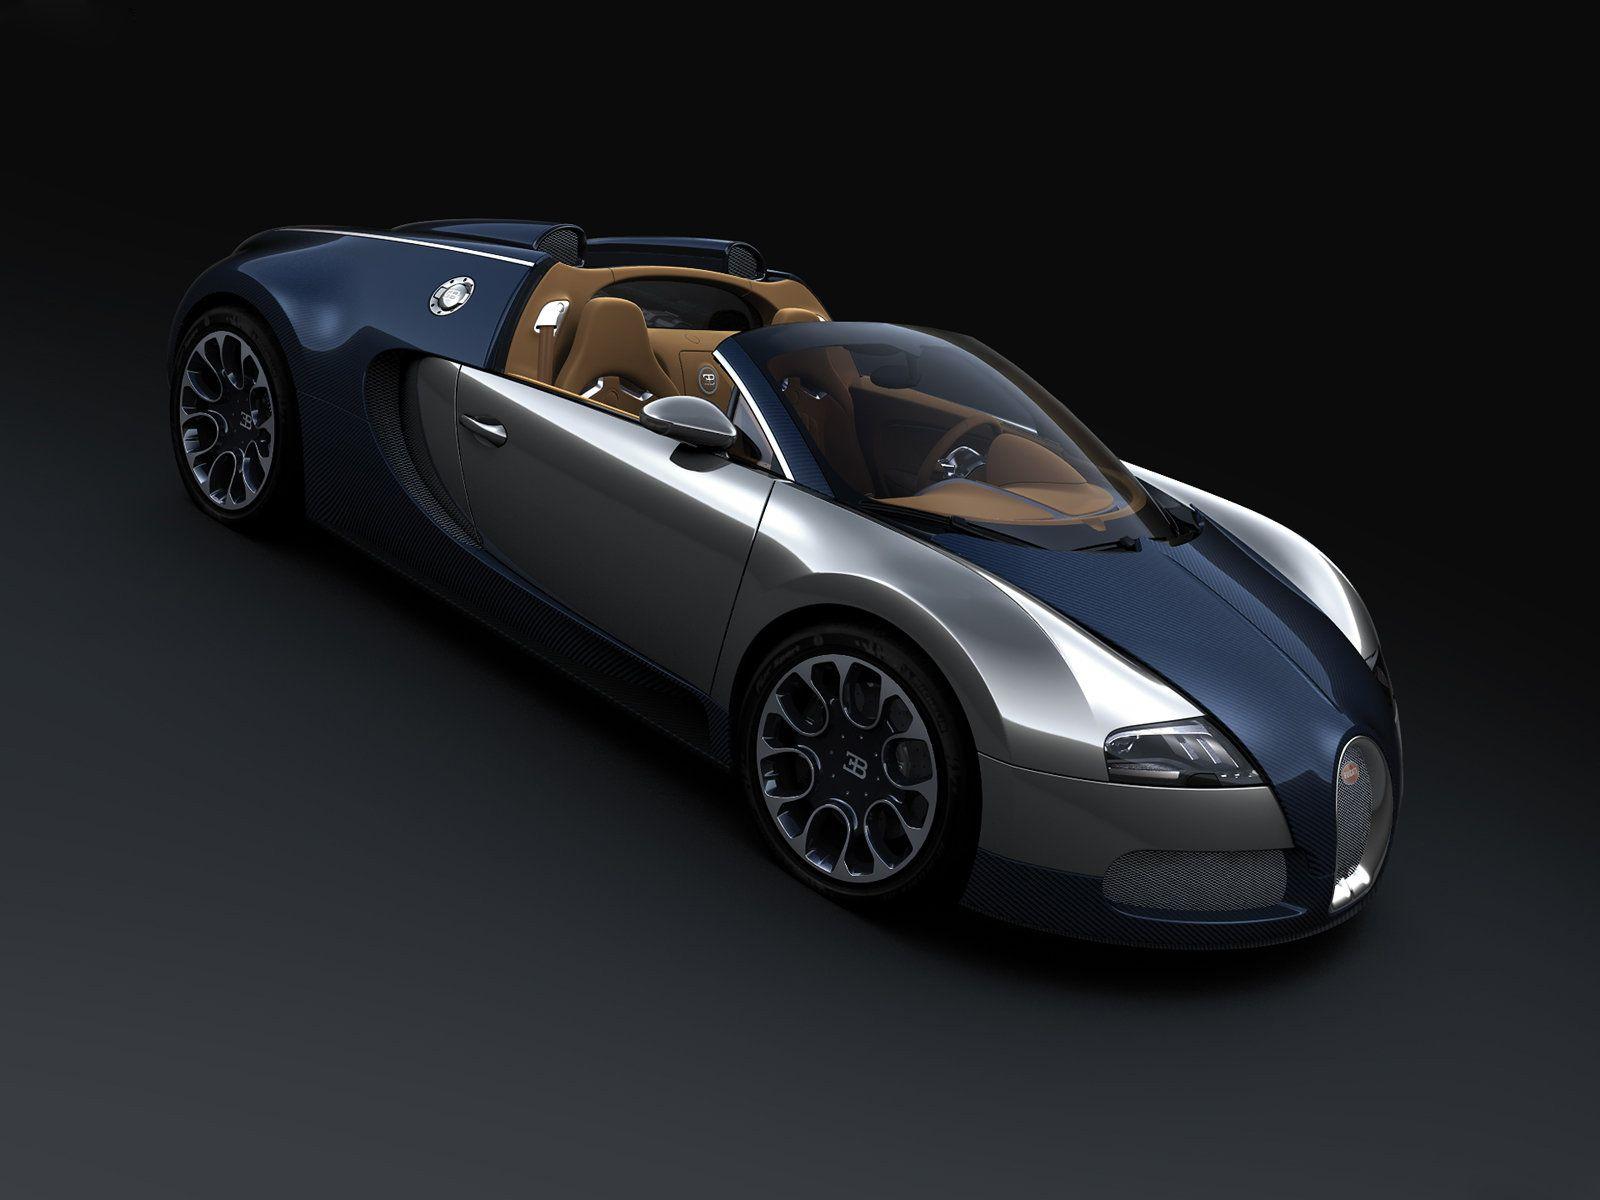 67242378231775786403c893dc04c75f Inspiring Bugatti Veyron Quarter Mile Speed Cars Trend